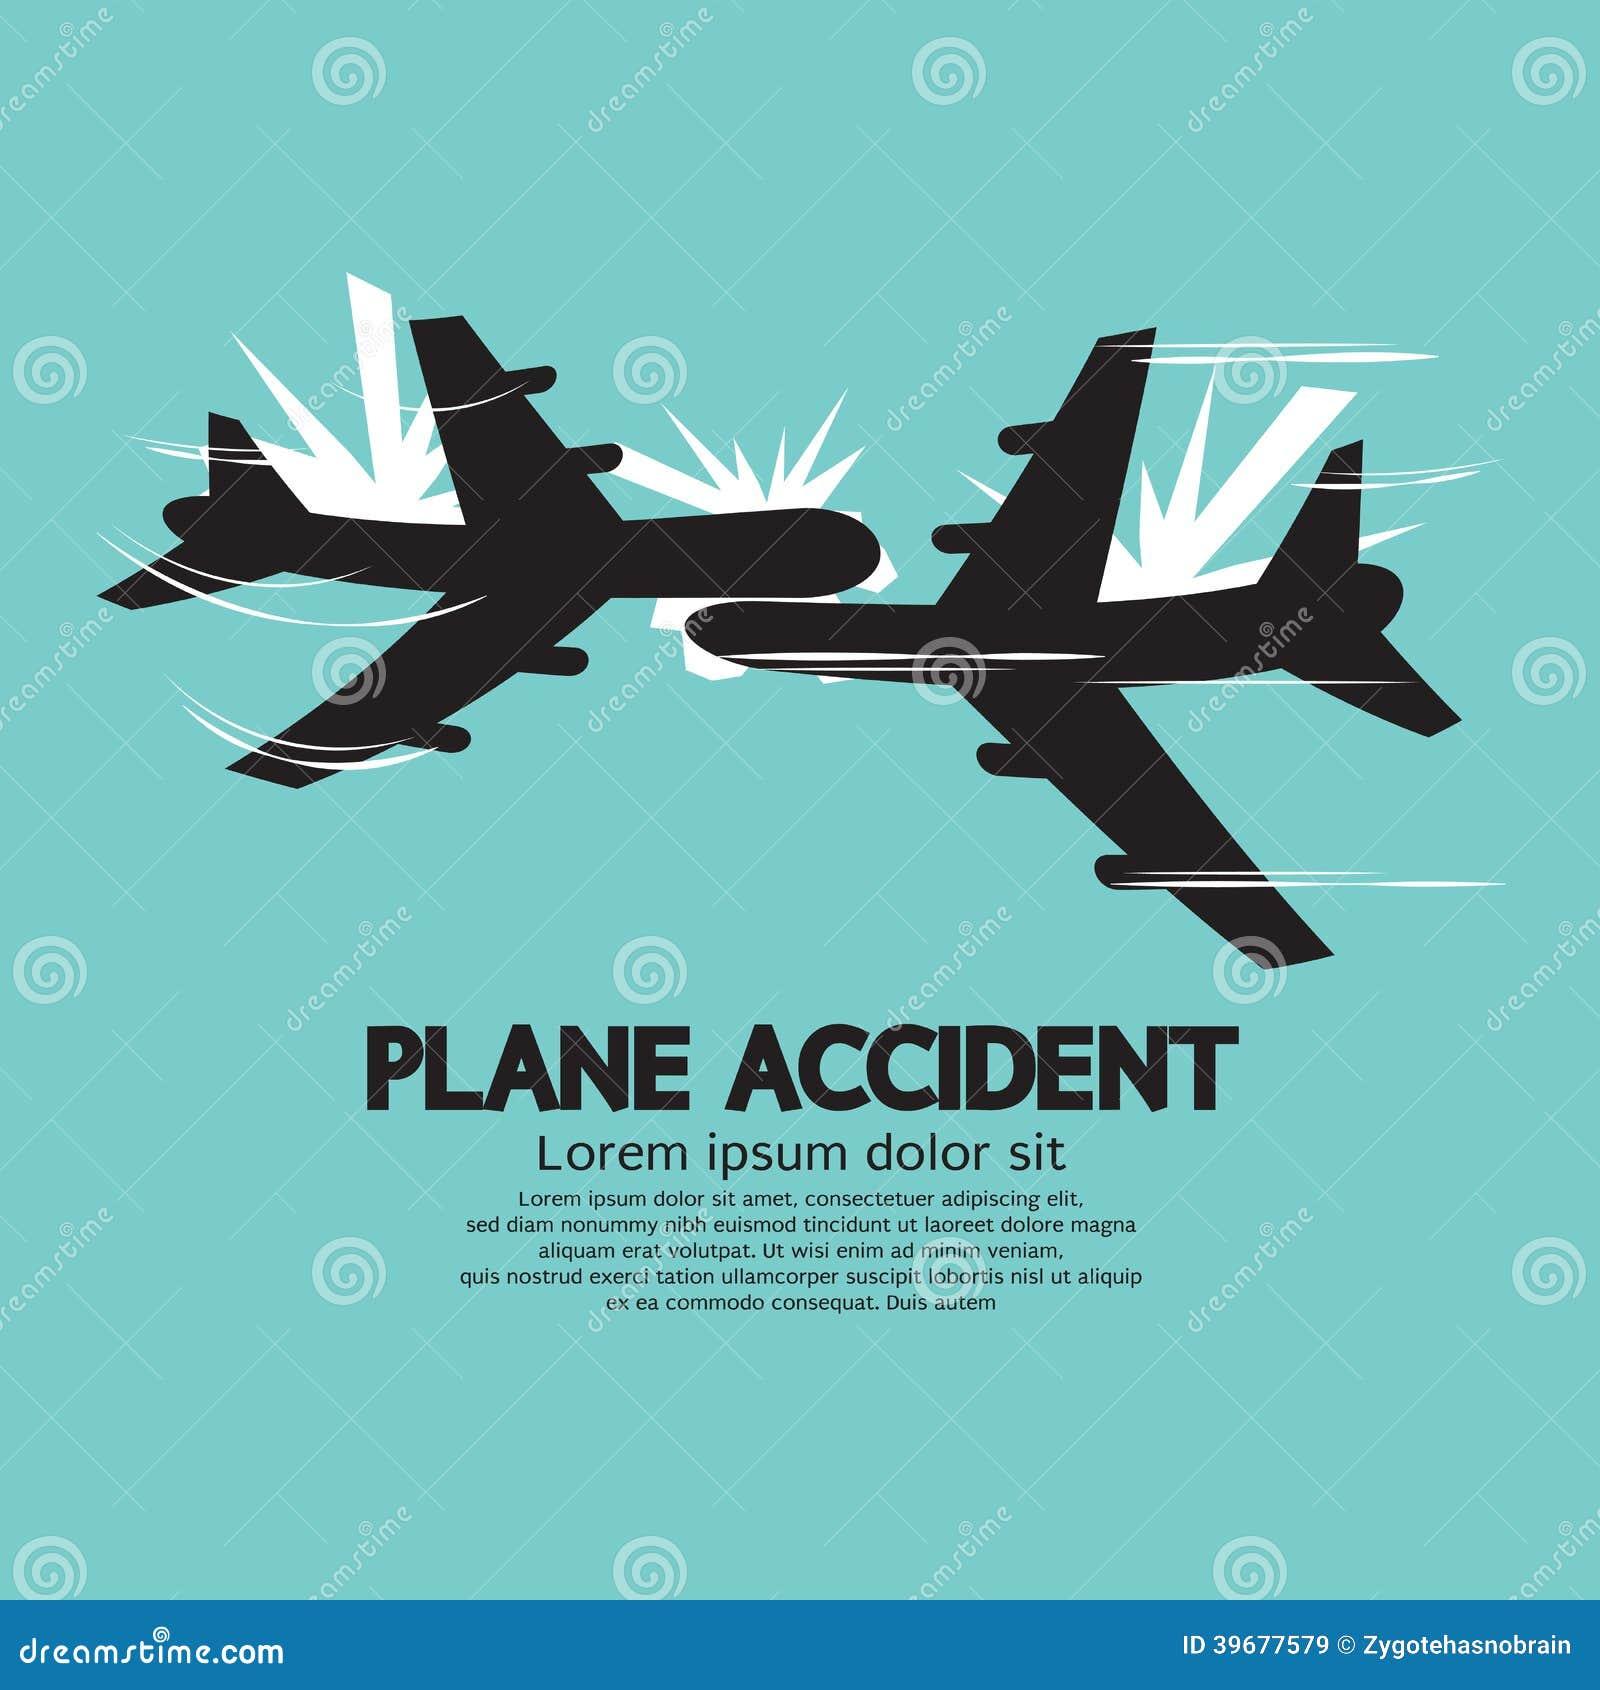 Airplane Crash Team Building Activity